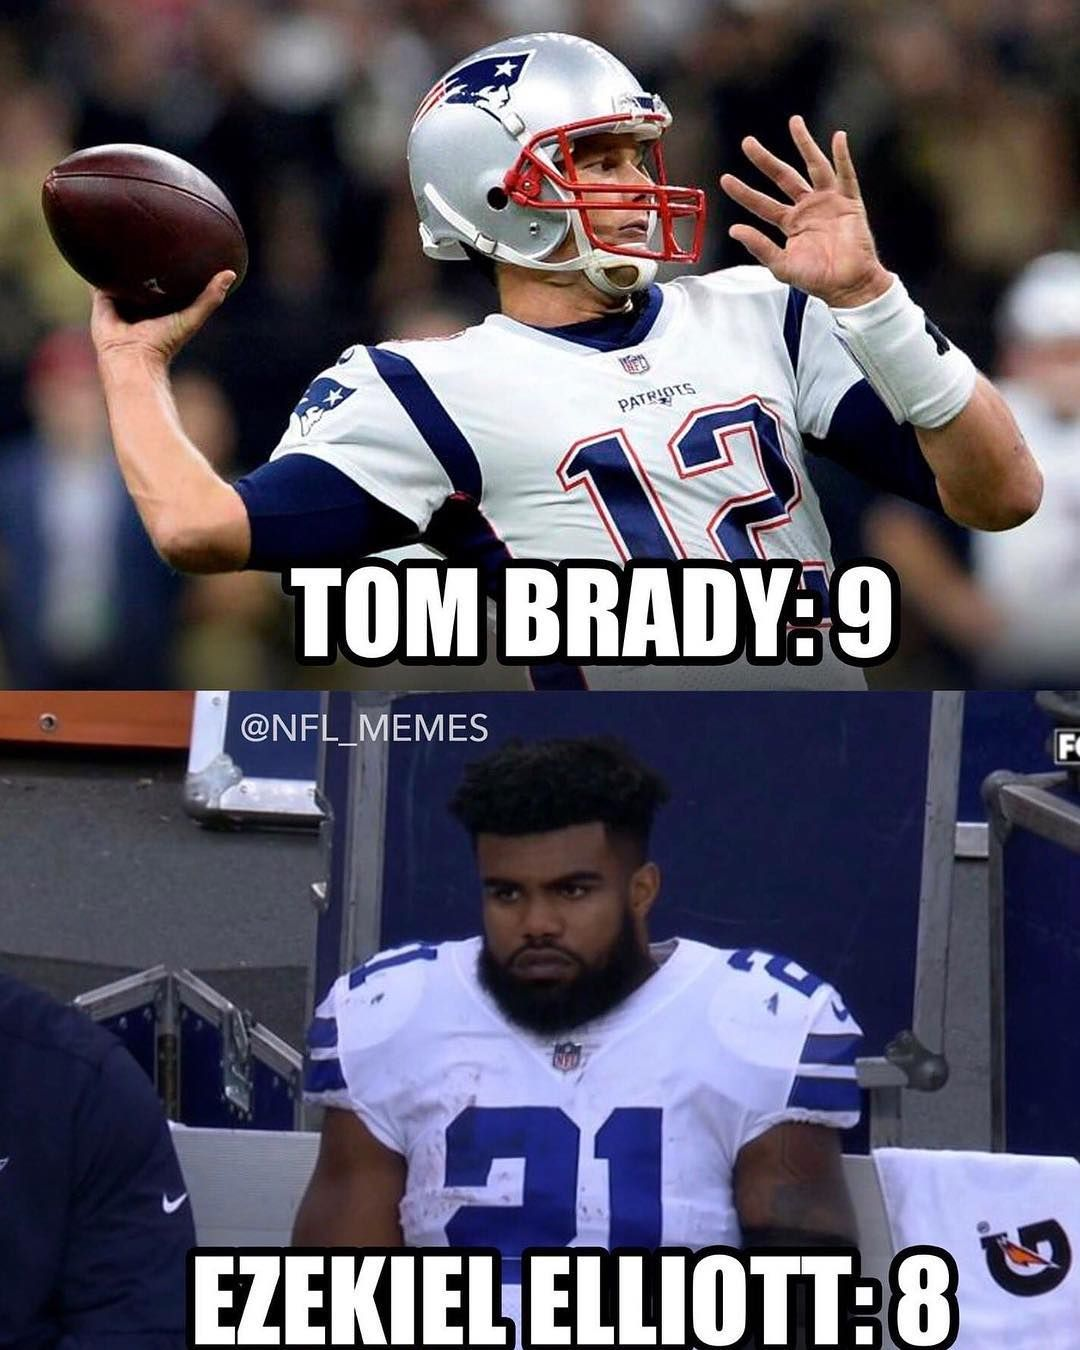 Tom Brady Had More Rushing Yards Than Zeke Today Nfl Memes Twitter Nfl Memes Tom Brady Ezekiel Elliott